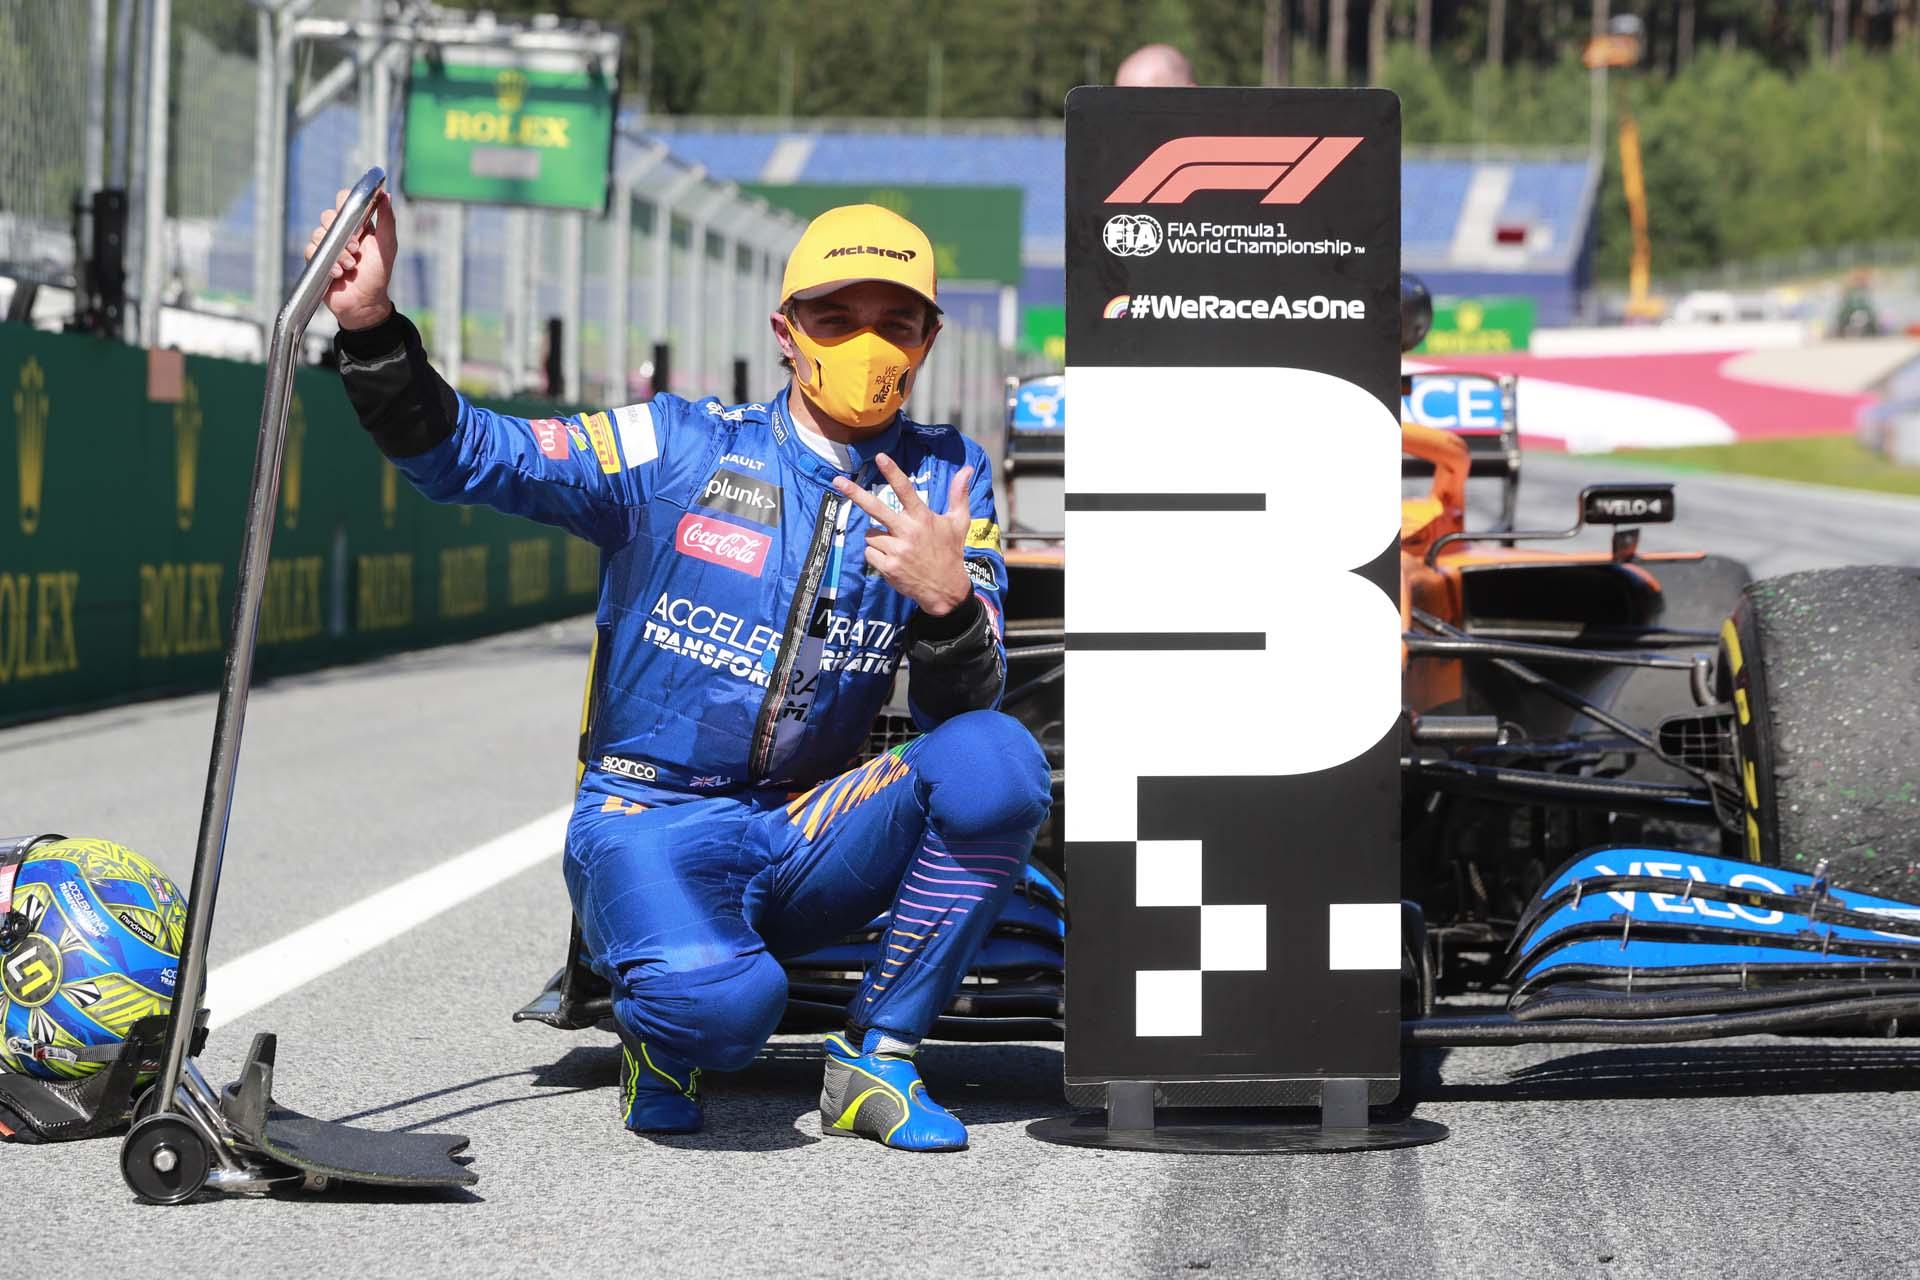 Lando Norris, McLaren, celebrates after taking a podium finish